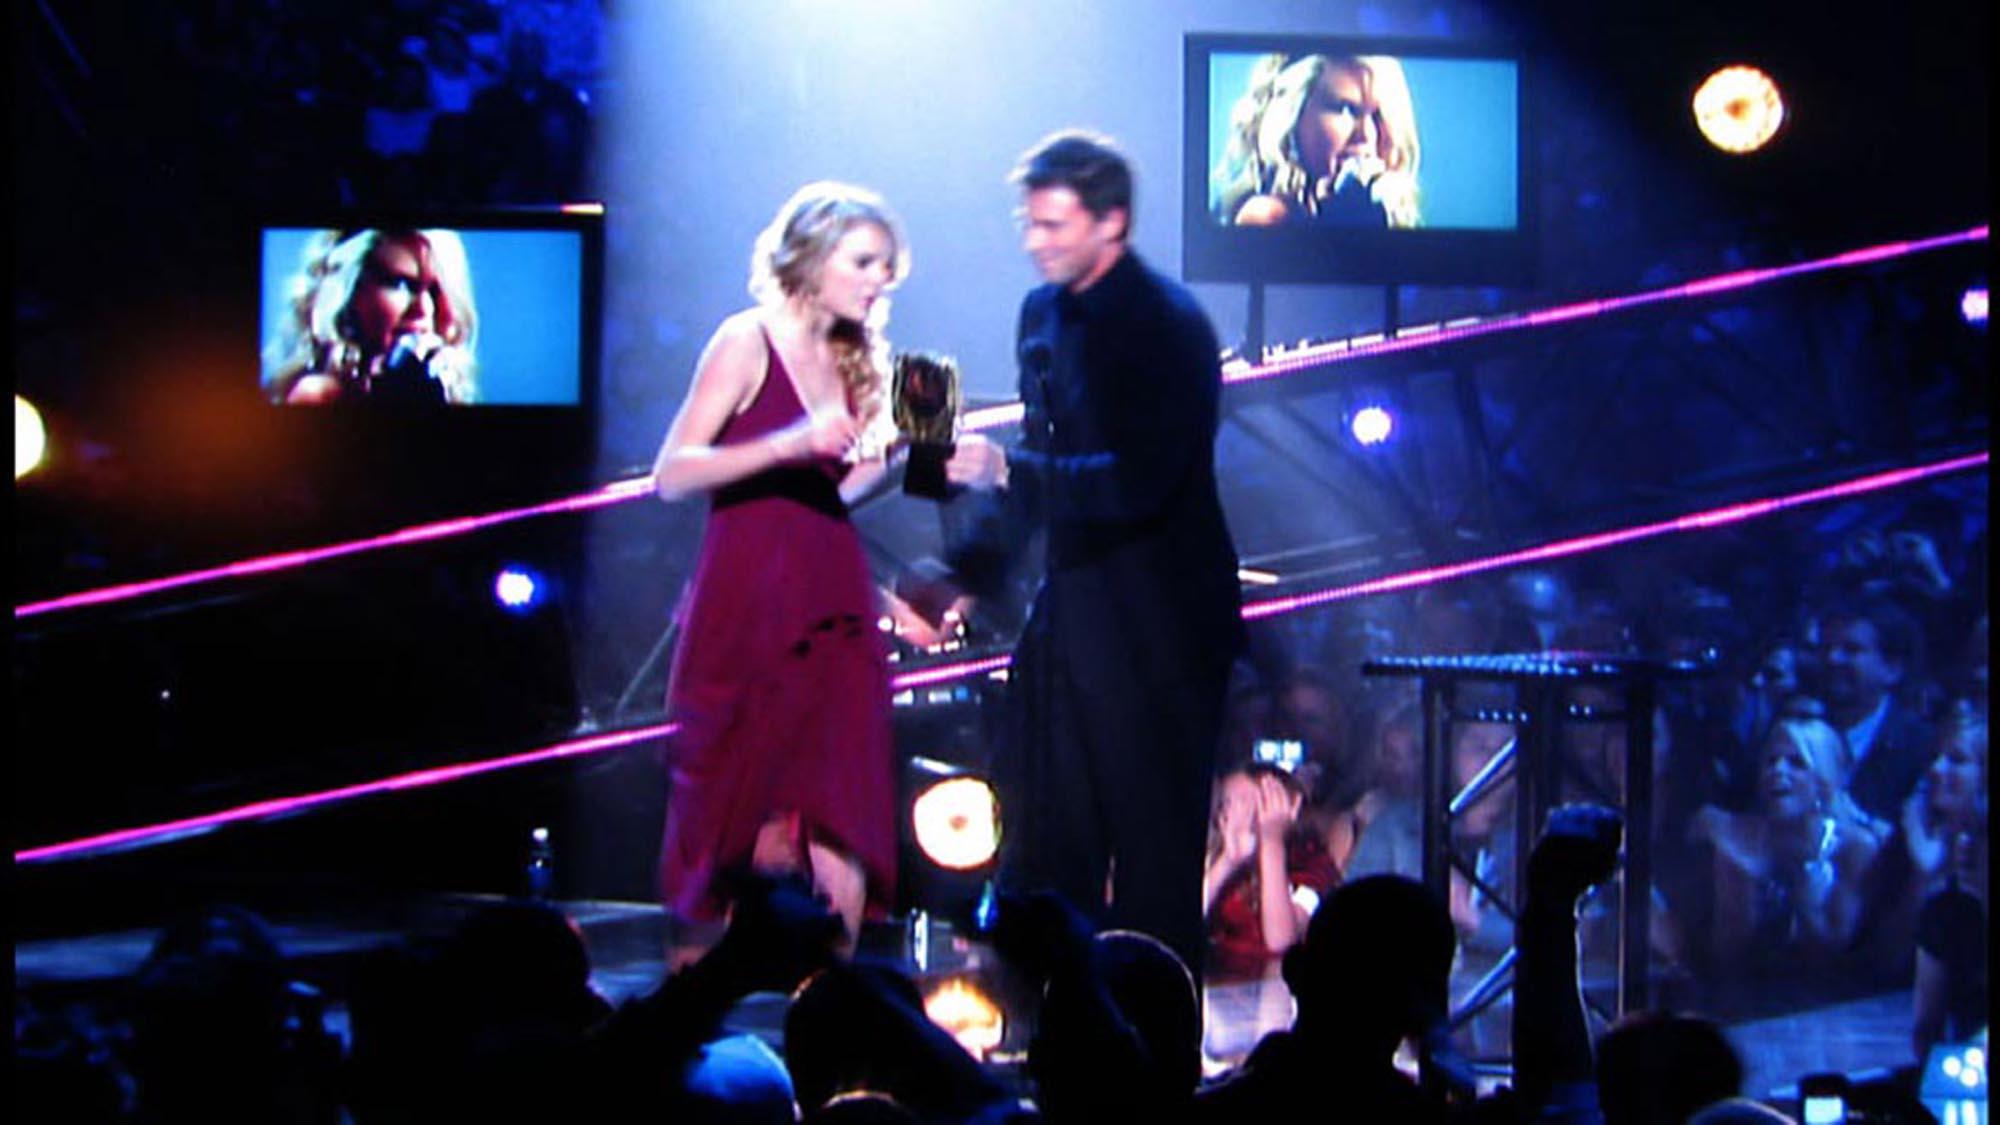 CMT_Awards_08_04-smsized